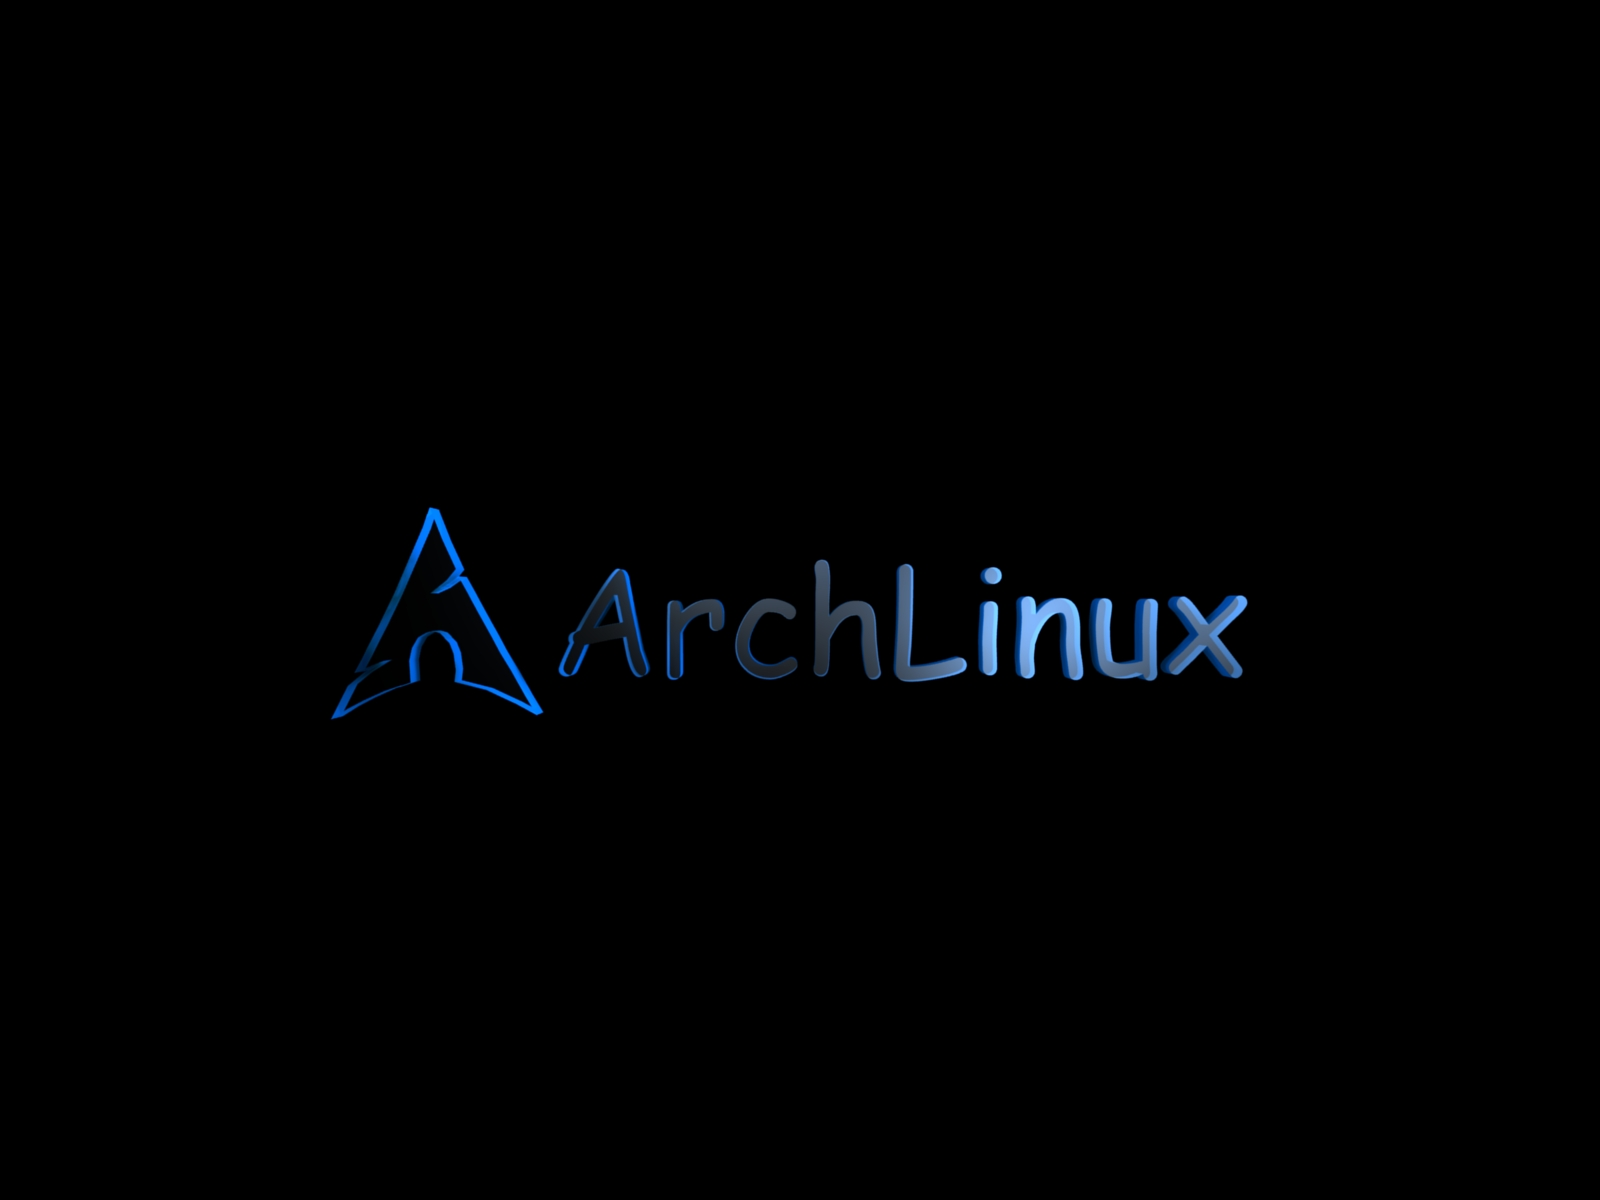 arch linux wallpaper black - photo #9